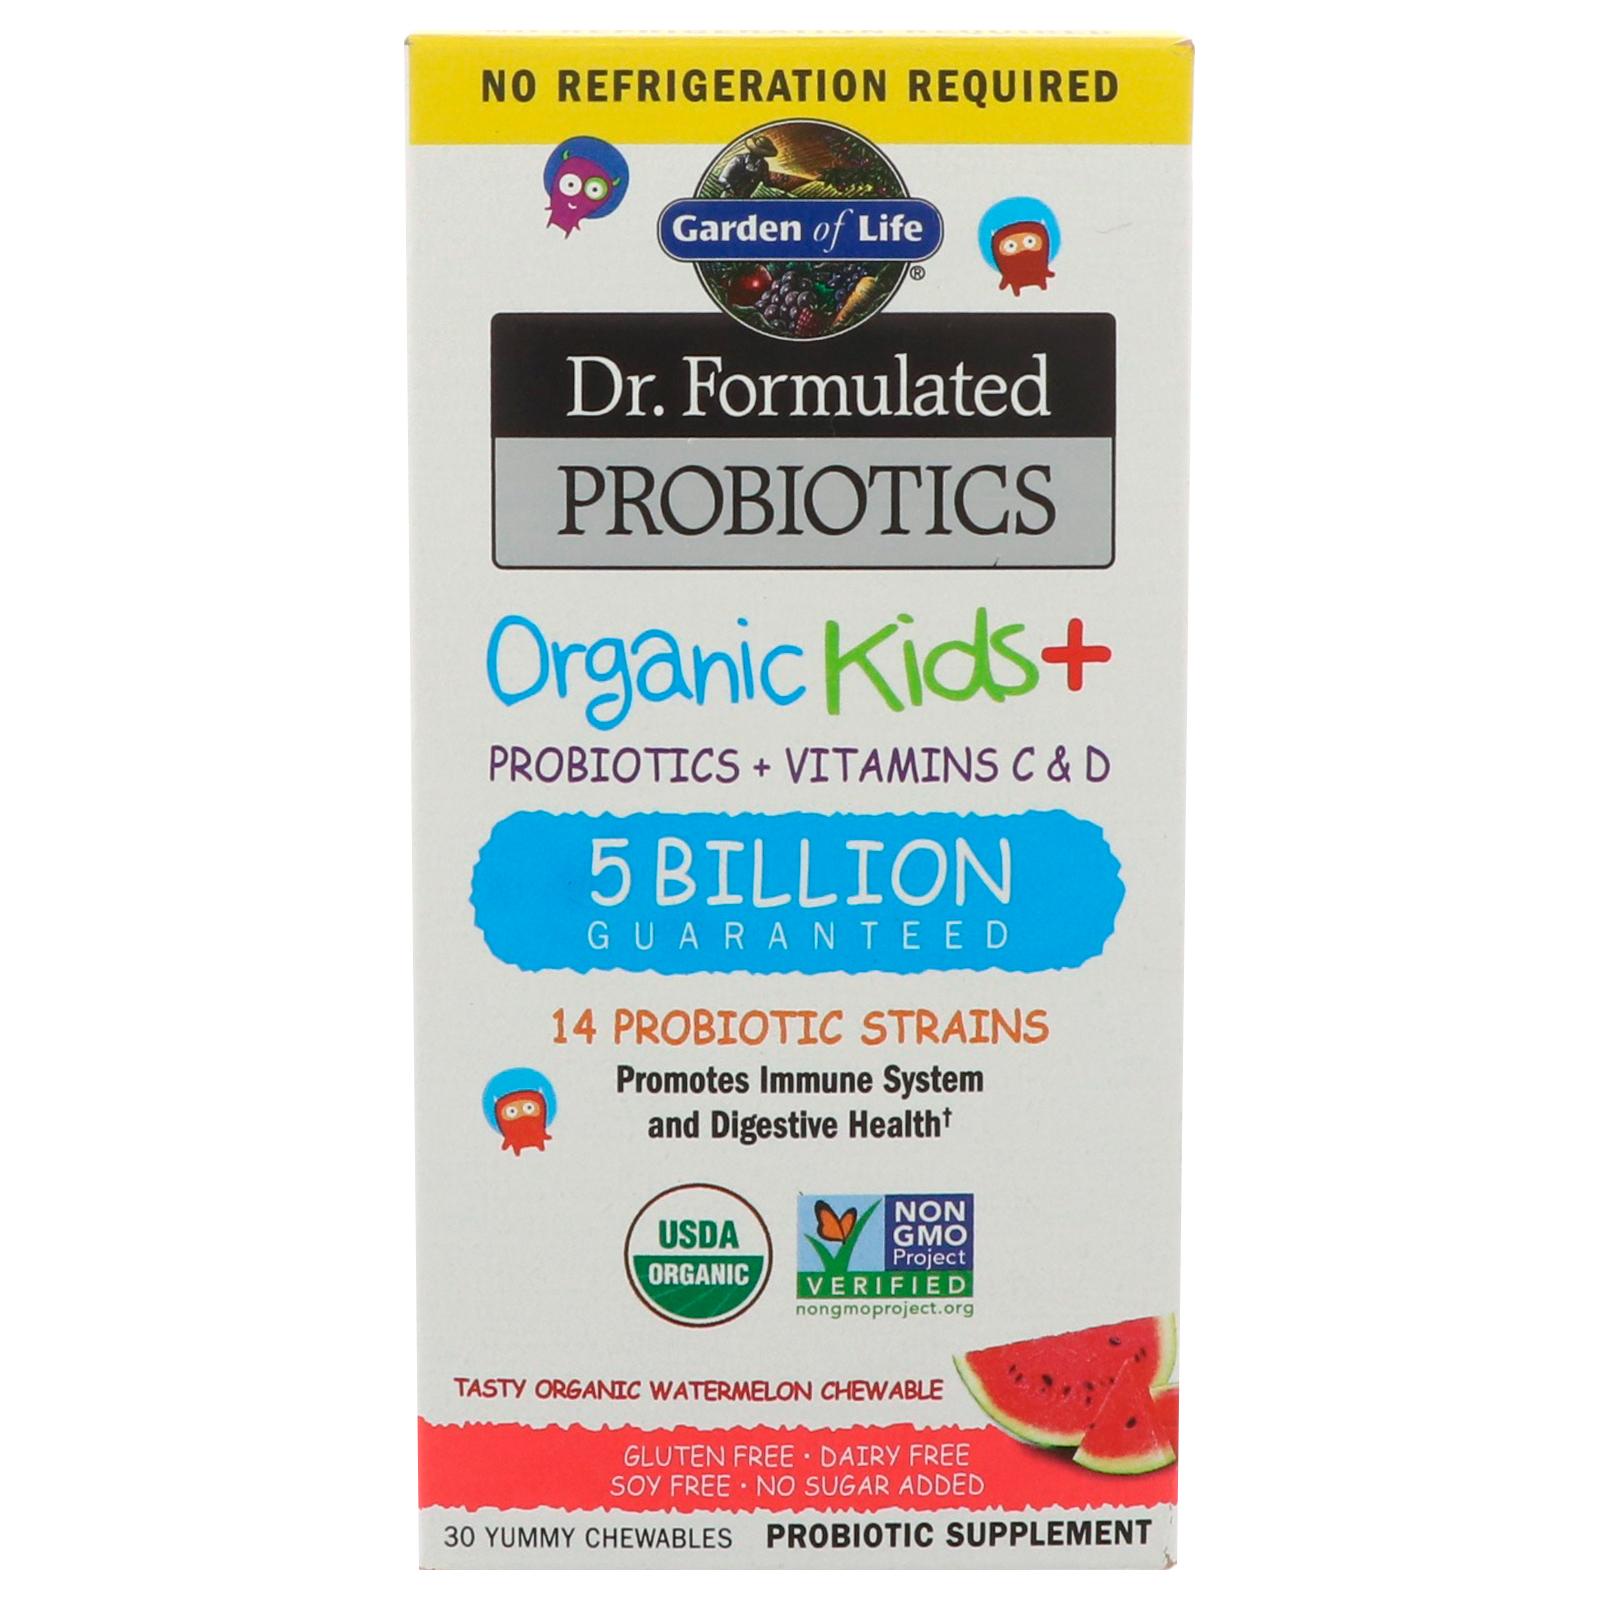 Garden Of Life Dr Formulated Probiotics Organic Kids Probiotics Vitamins C D 5 Billion